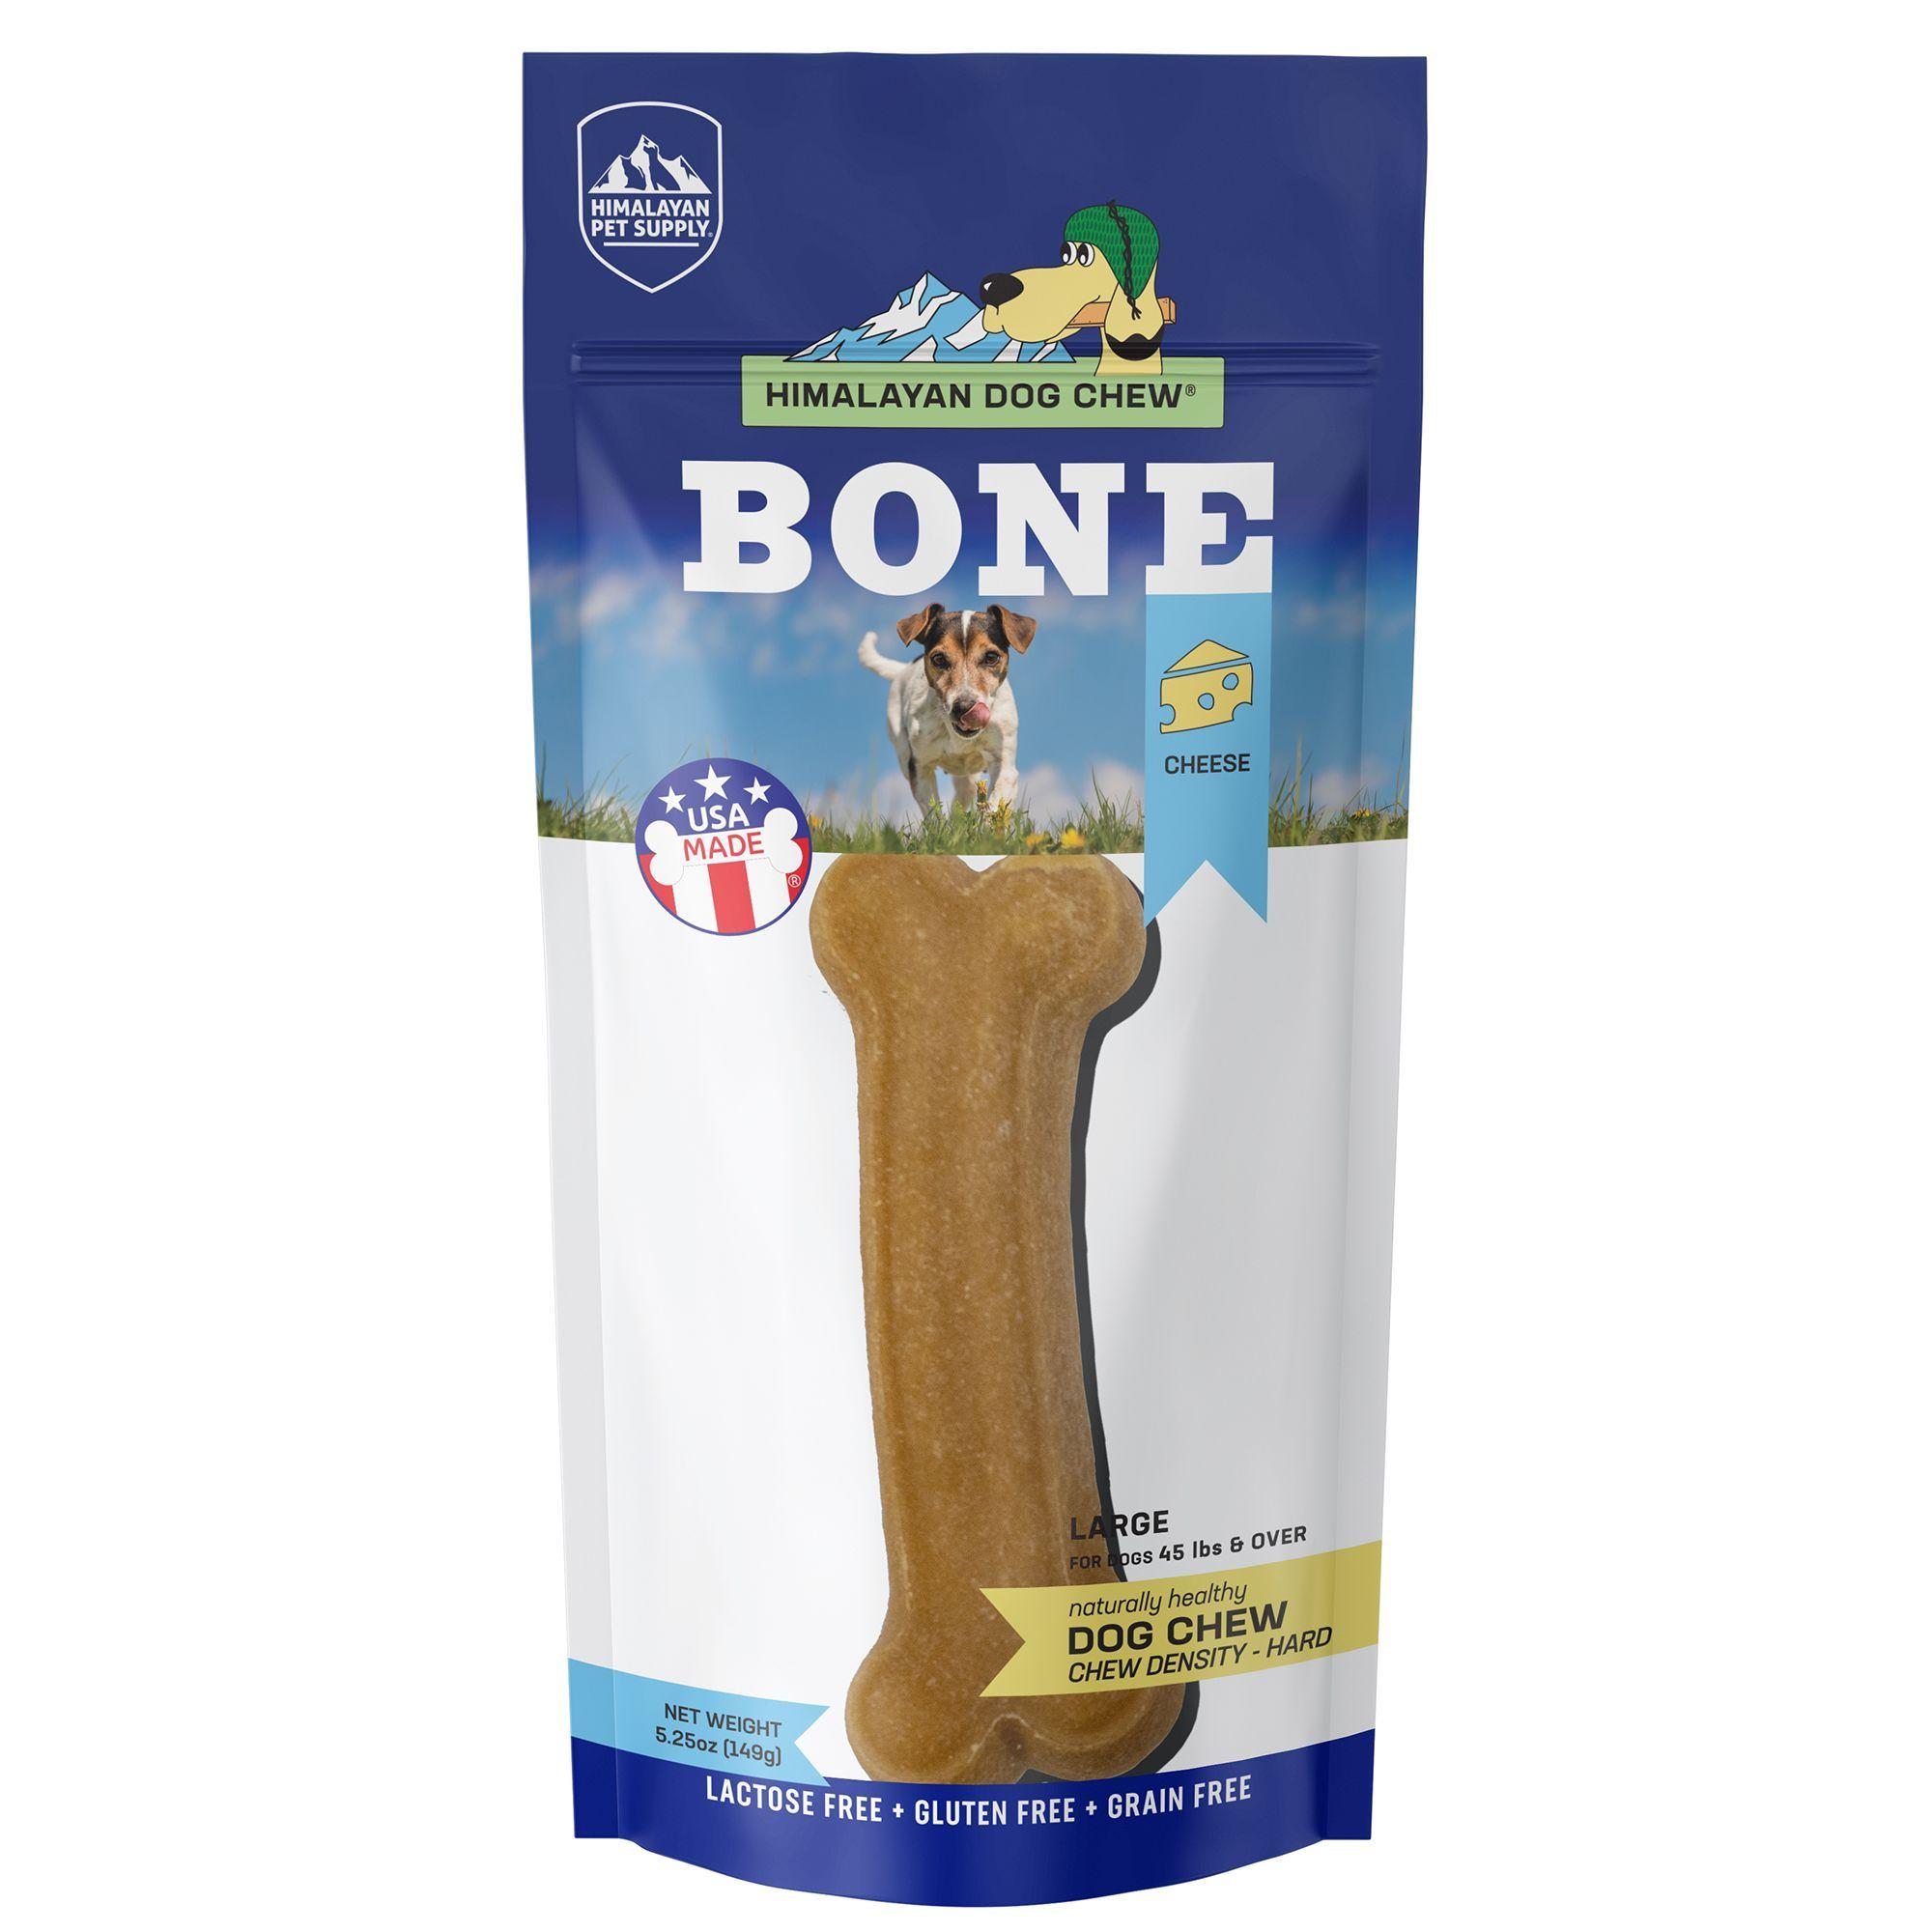 Himalayan Dog Chew® Bone Dog Treat - Natural, Grain Free, Cheese